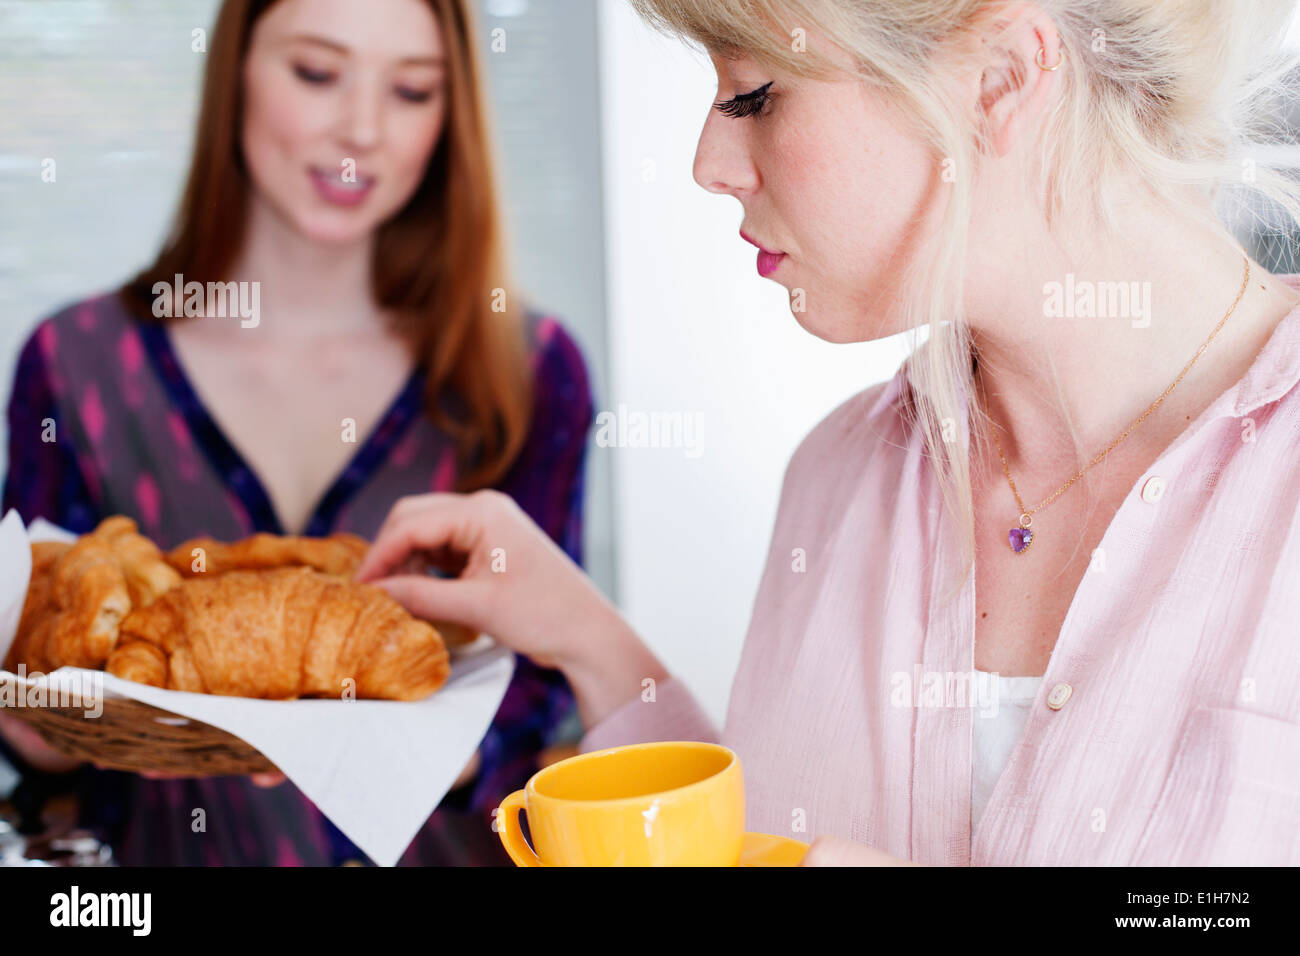 Junge Frauen mit croissants Stockbild